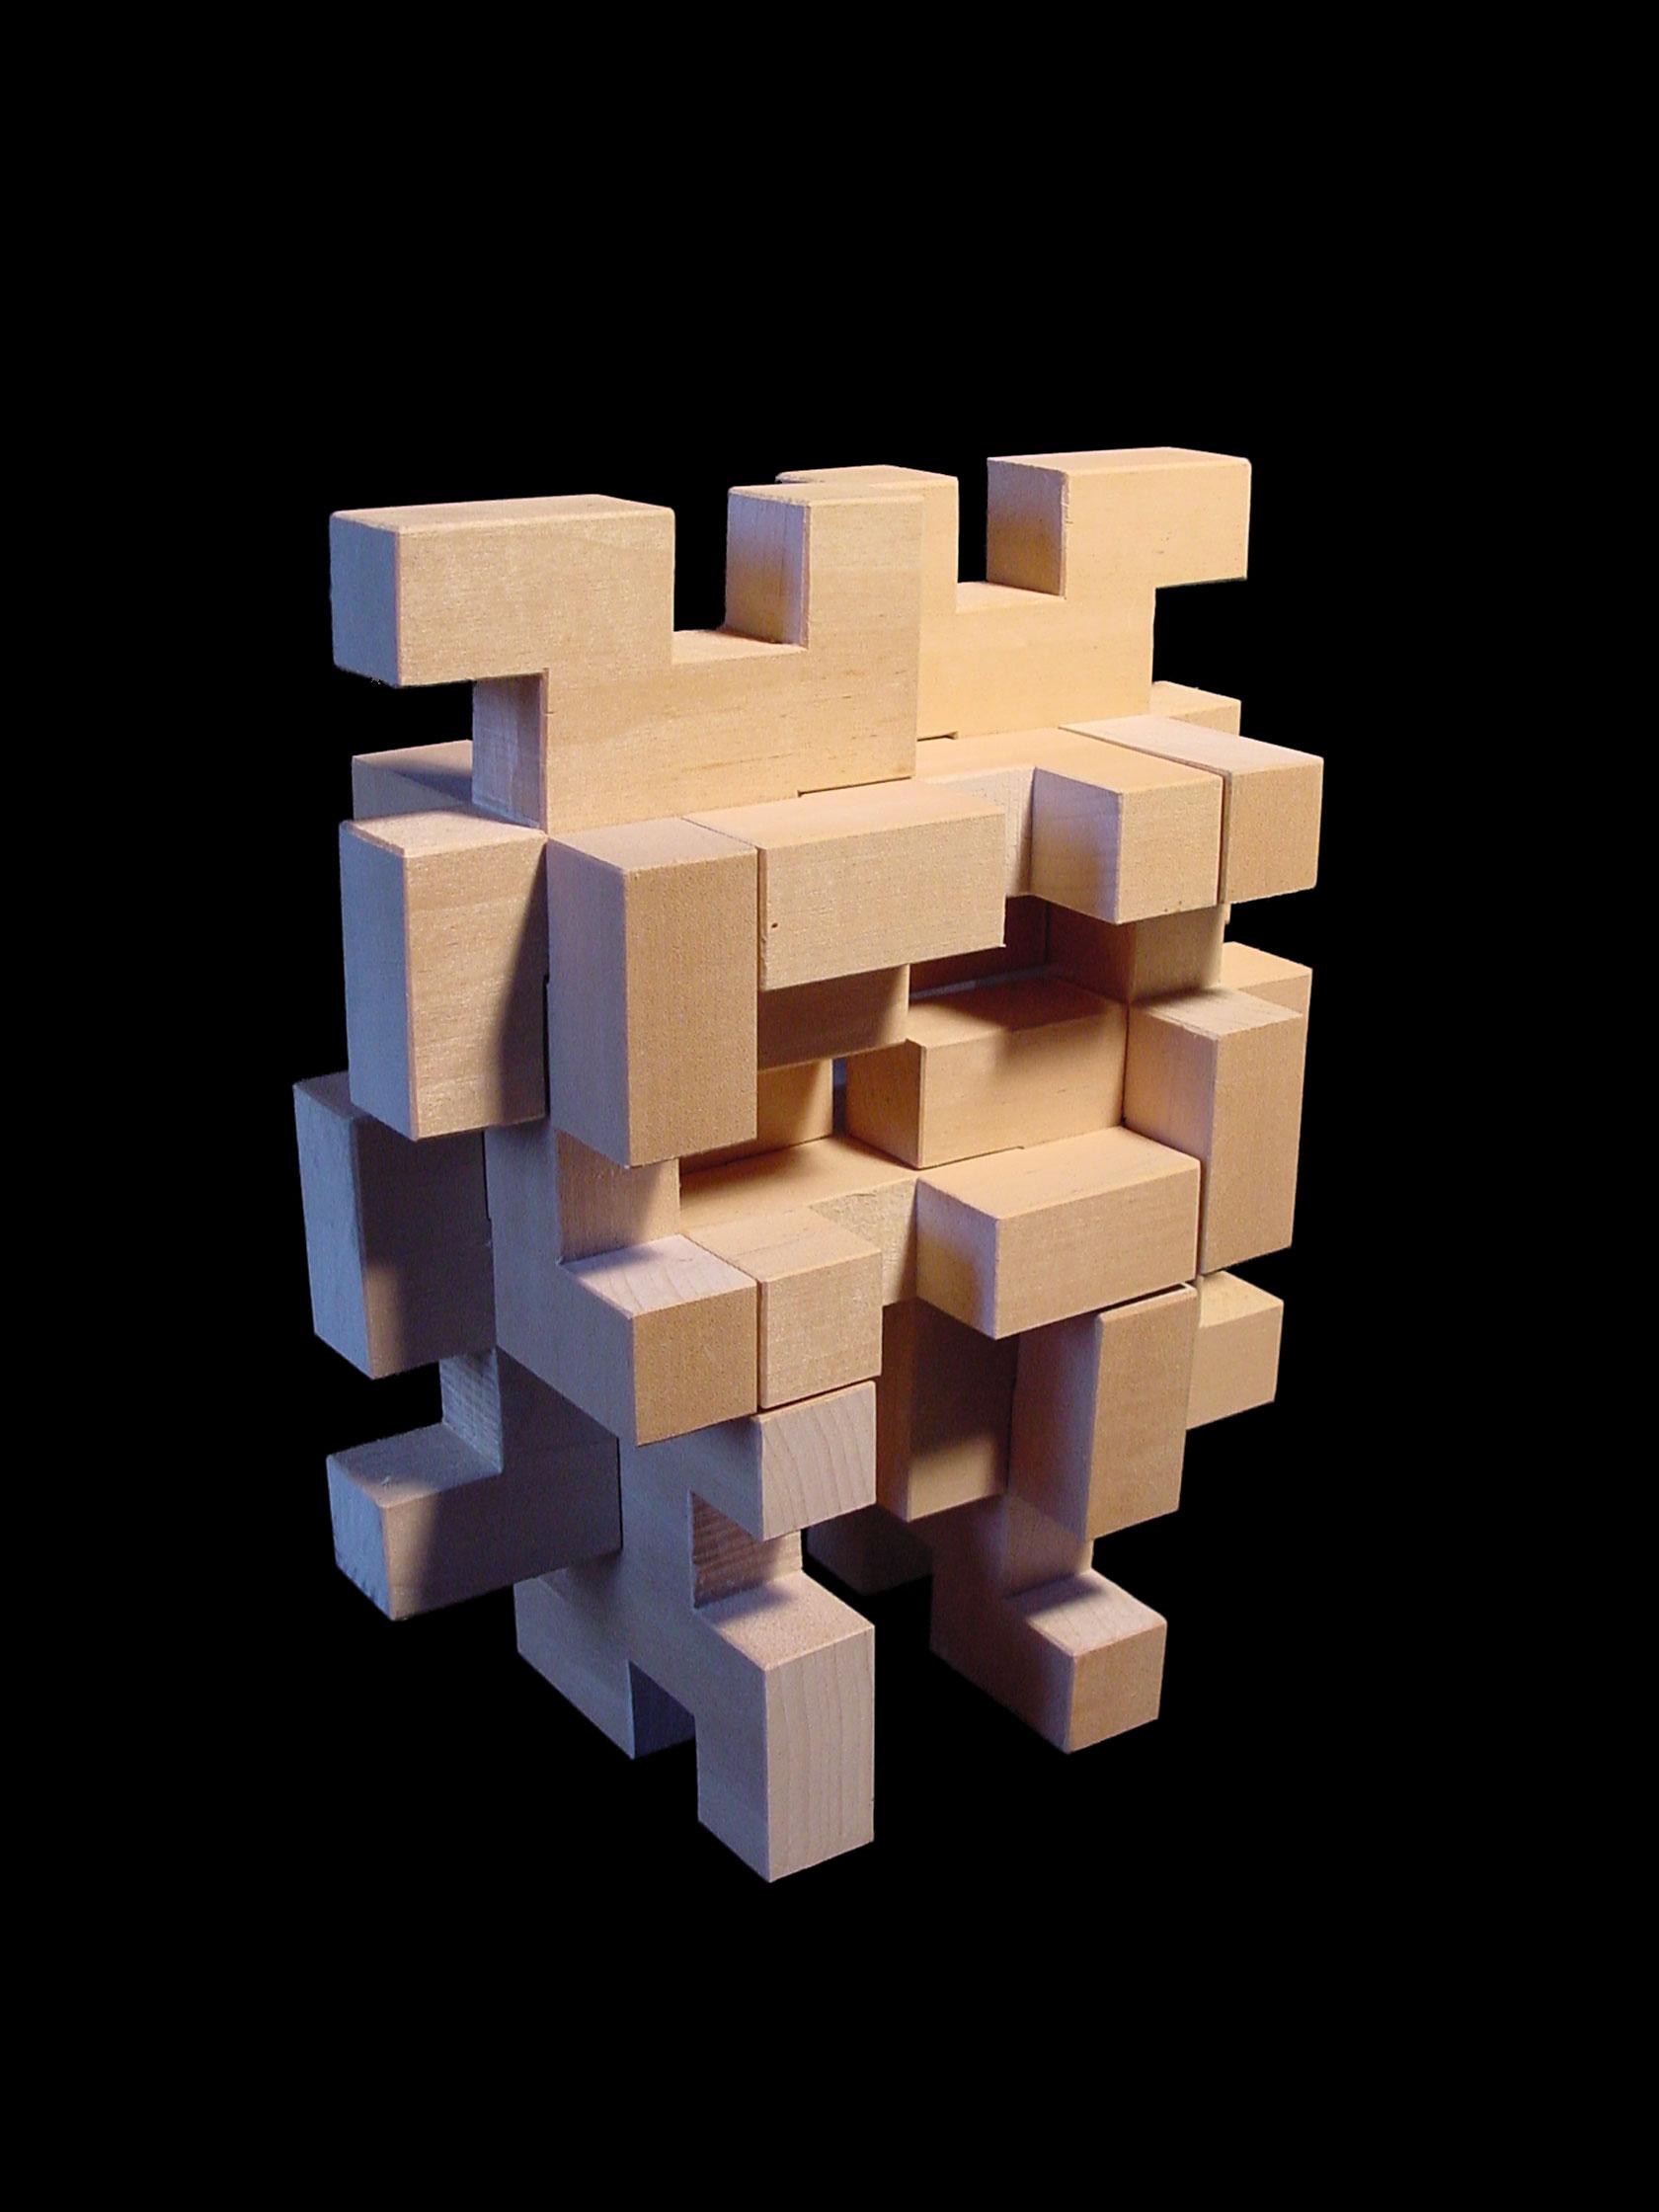 Robot configuration